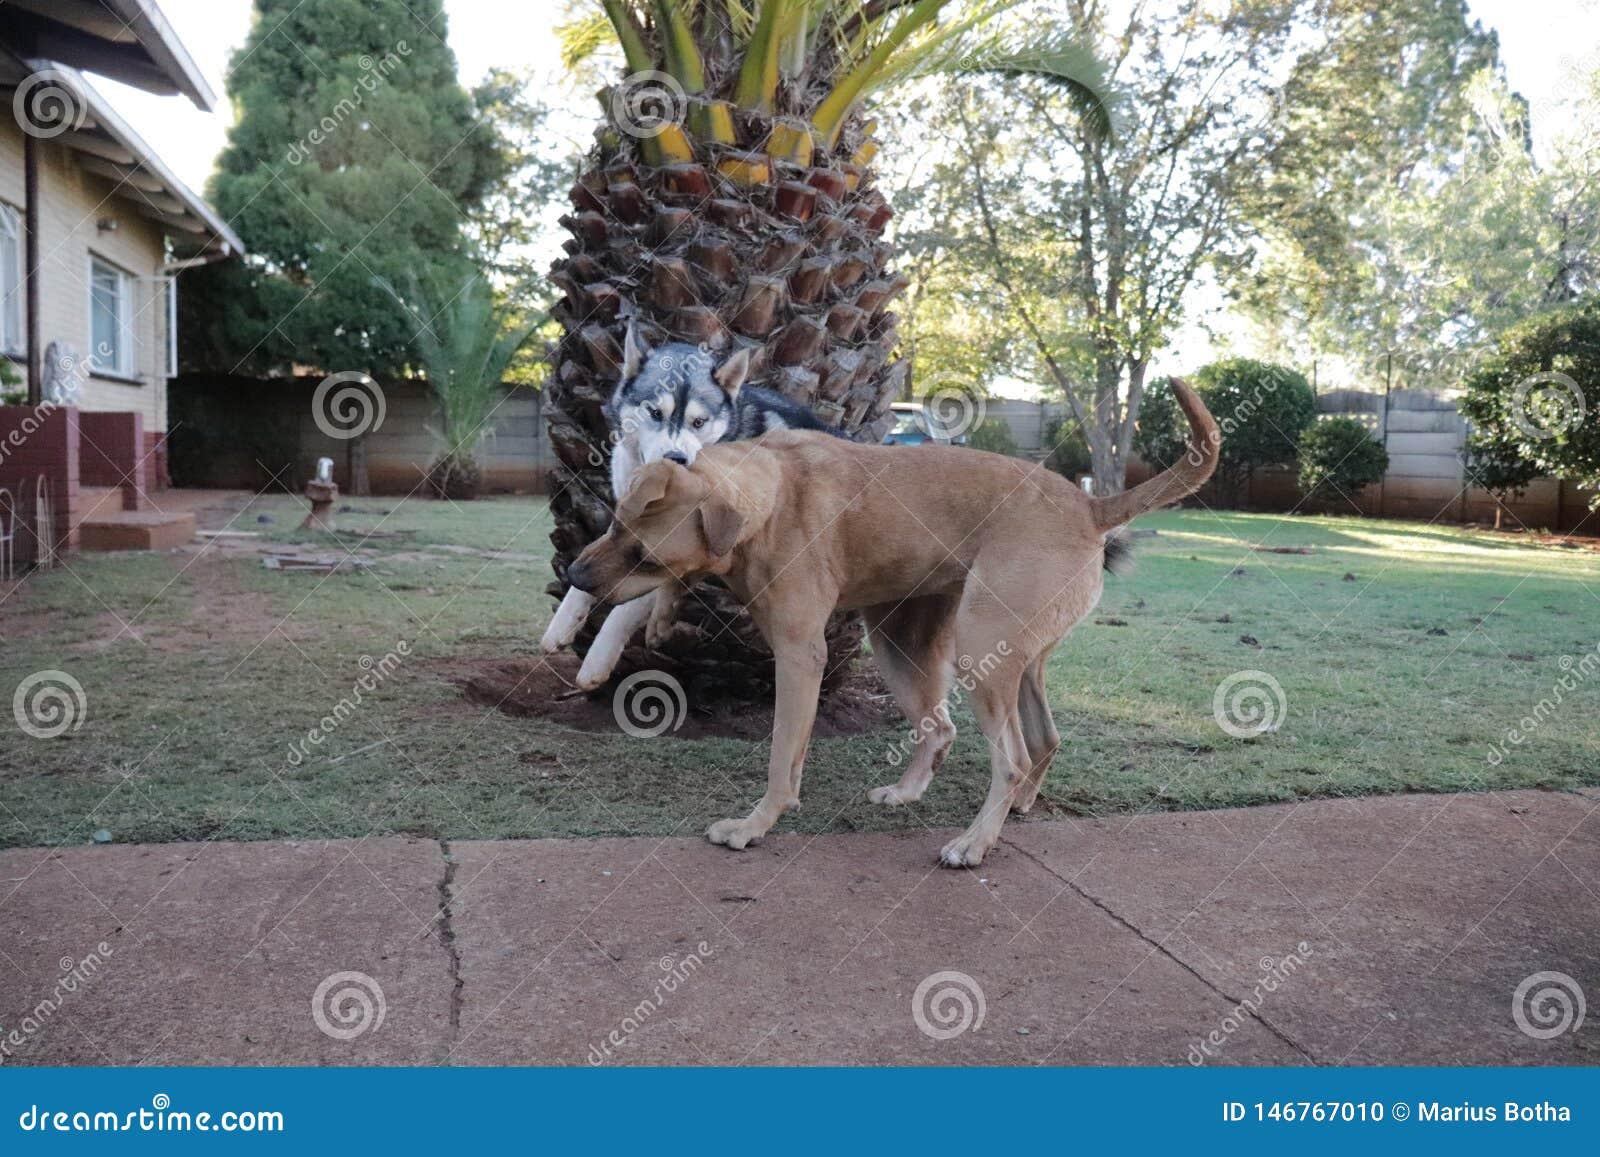 Rhodesian Ridgeback und Husky Enjoying Playtime Together